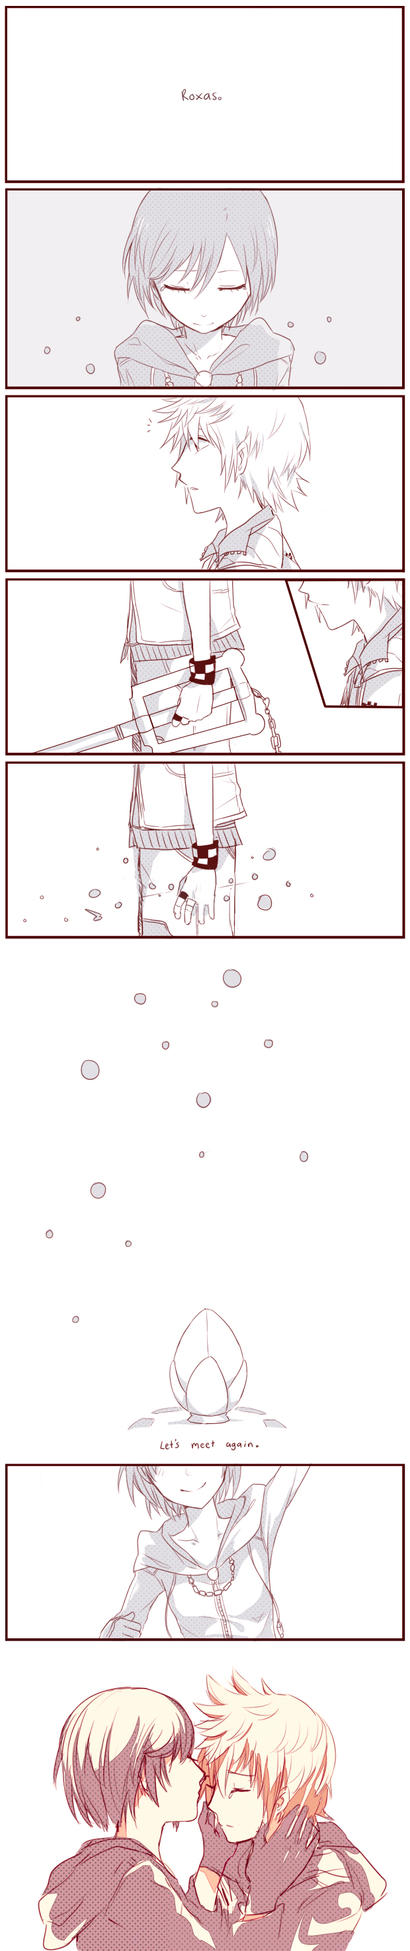 RokuShi: Let's meet again. by karudoll